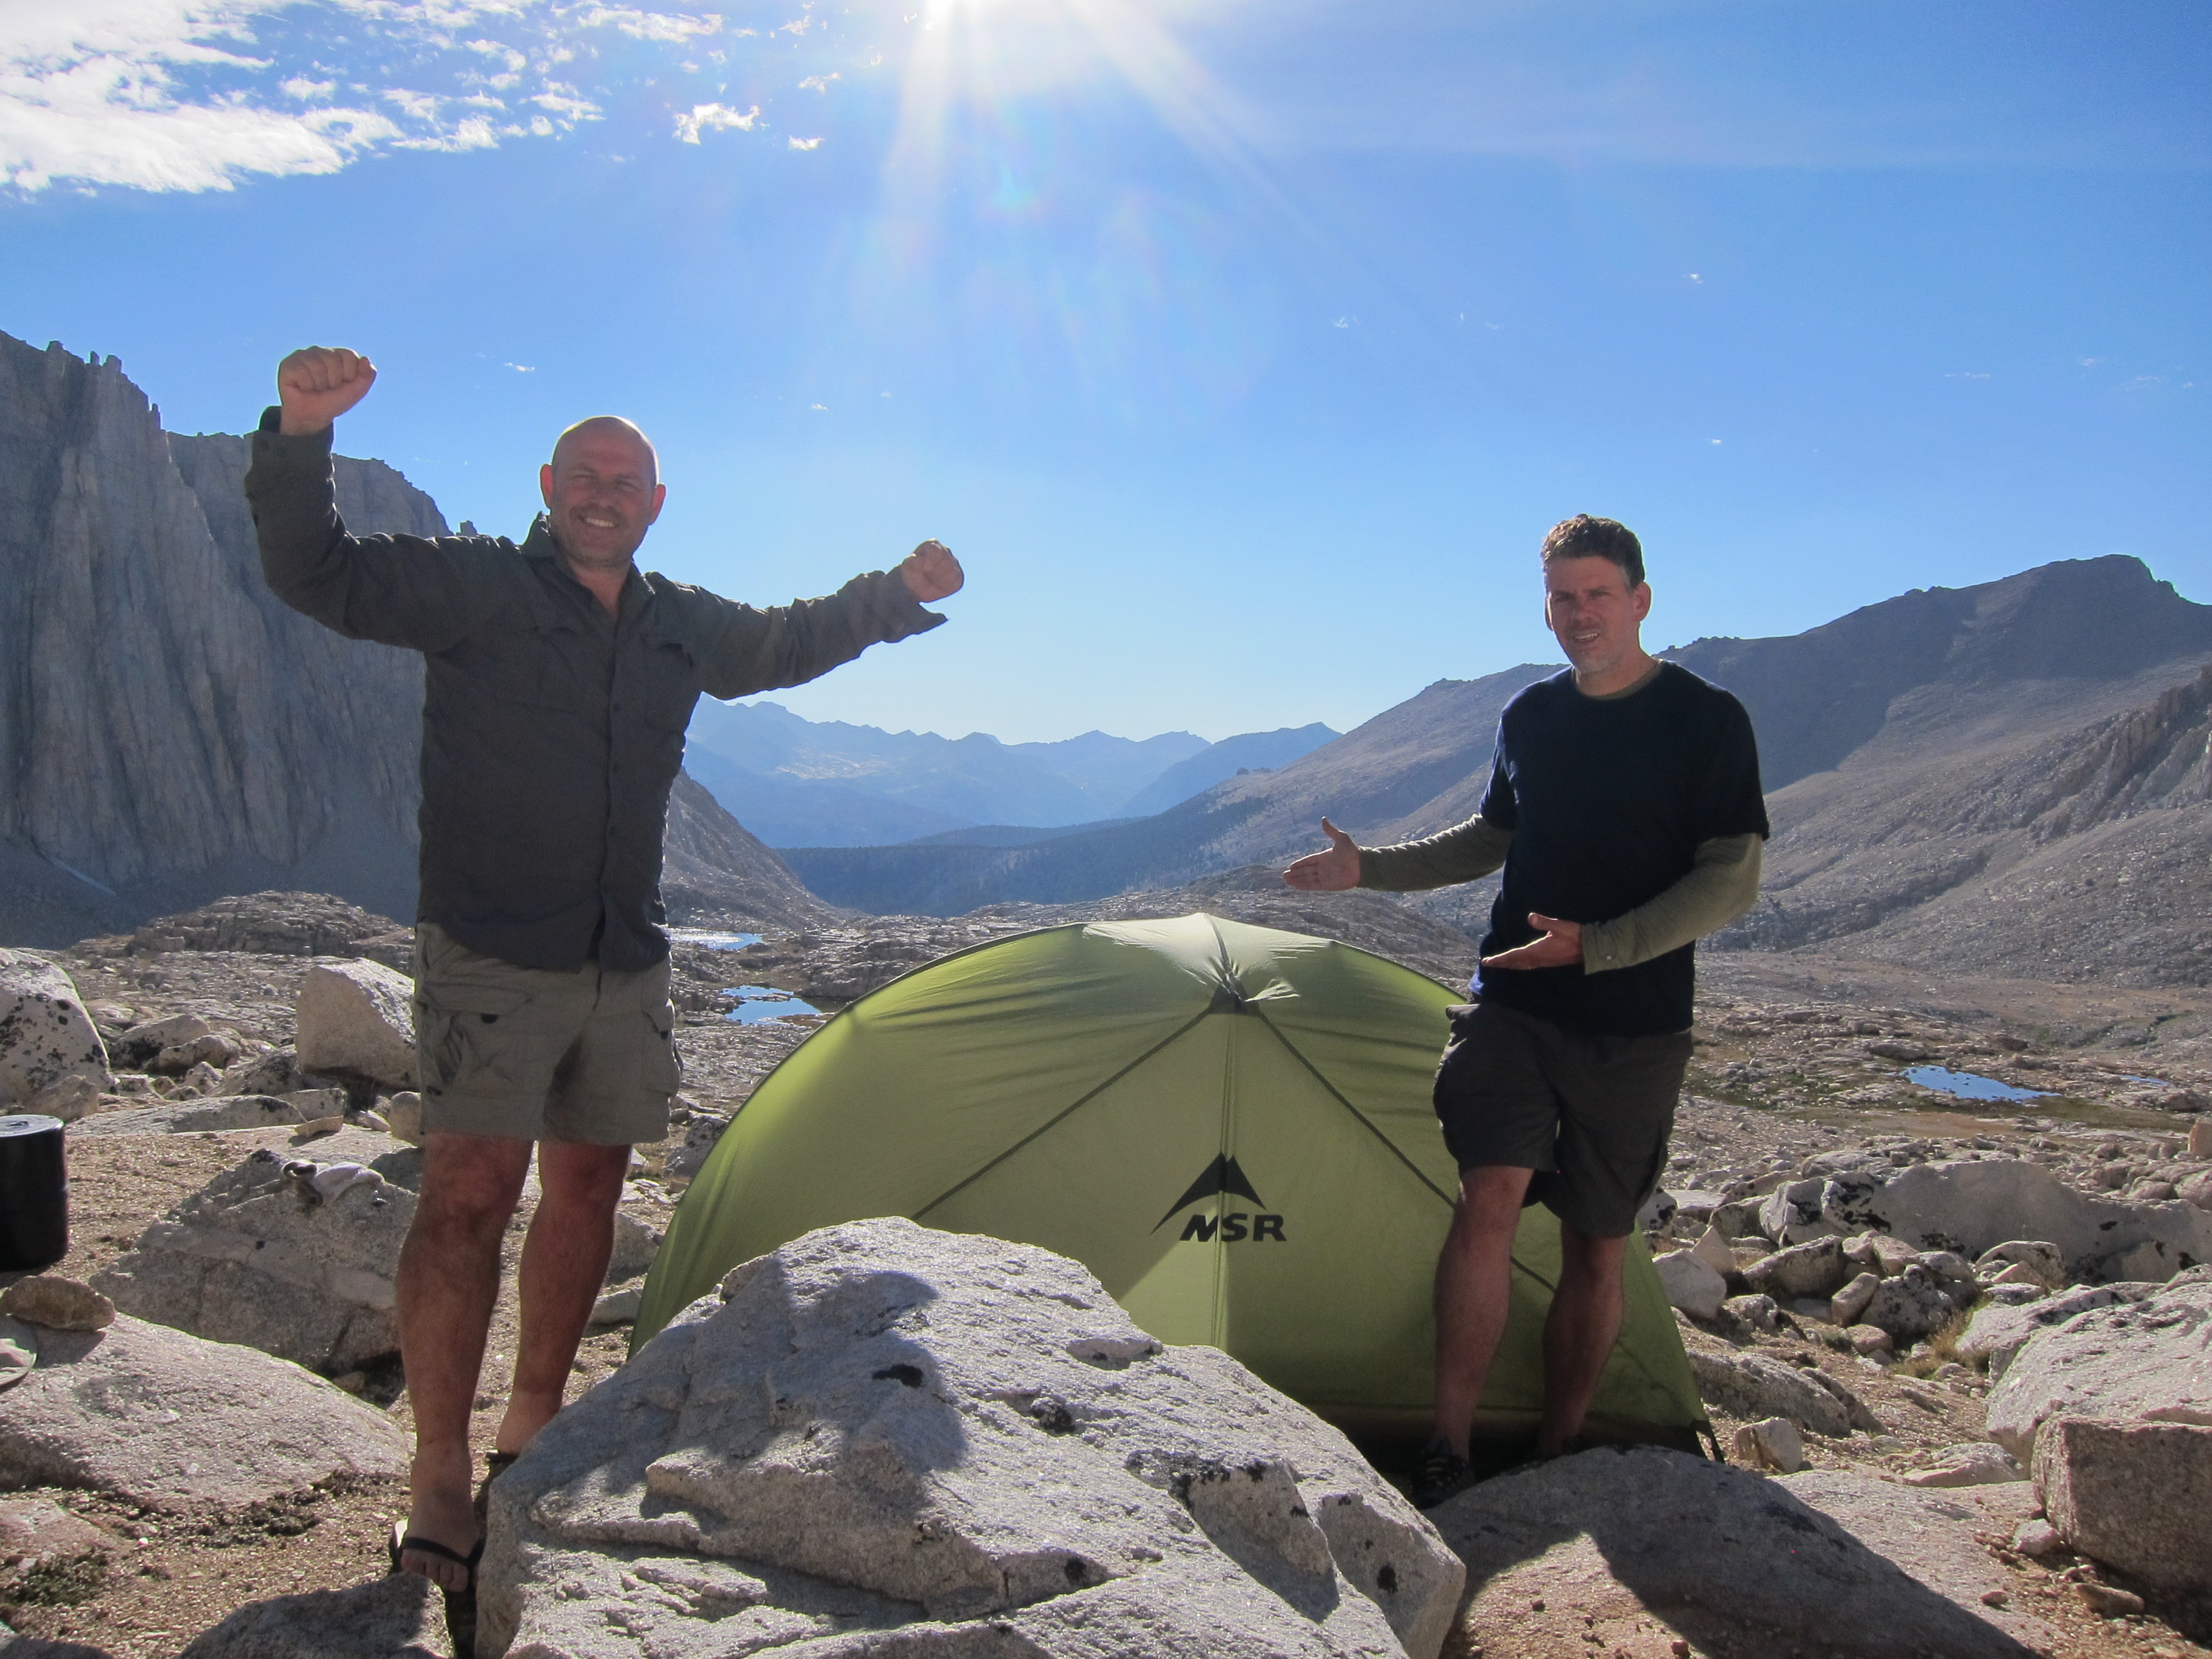 whitney, camping, msr tents, giampiero ambrosi